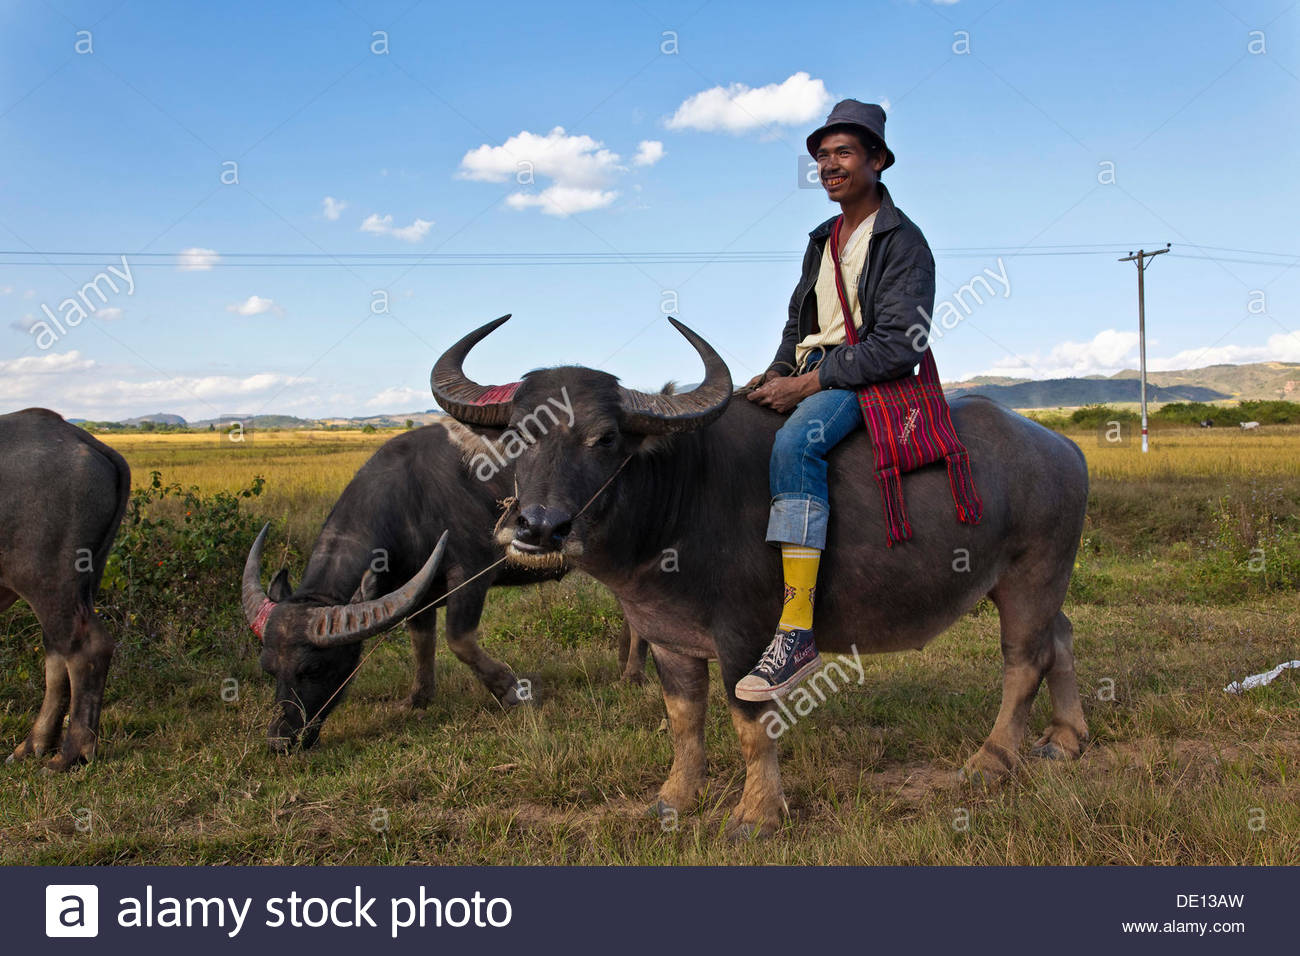 Man with a buffalo